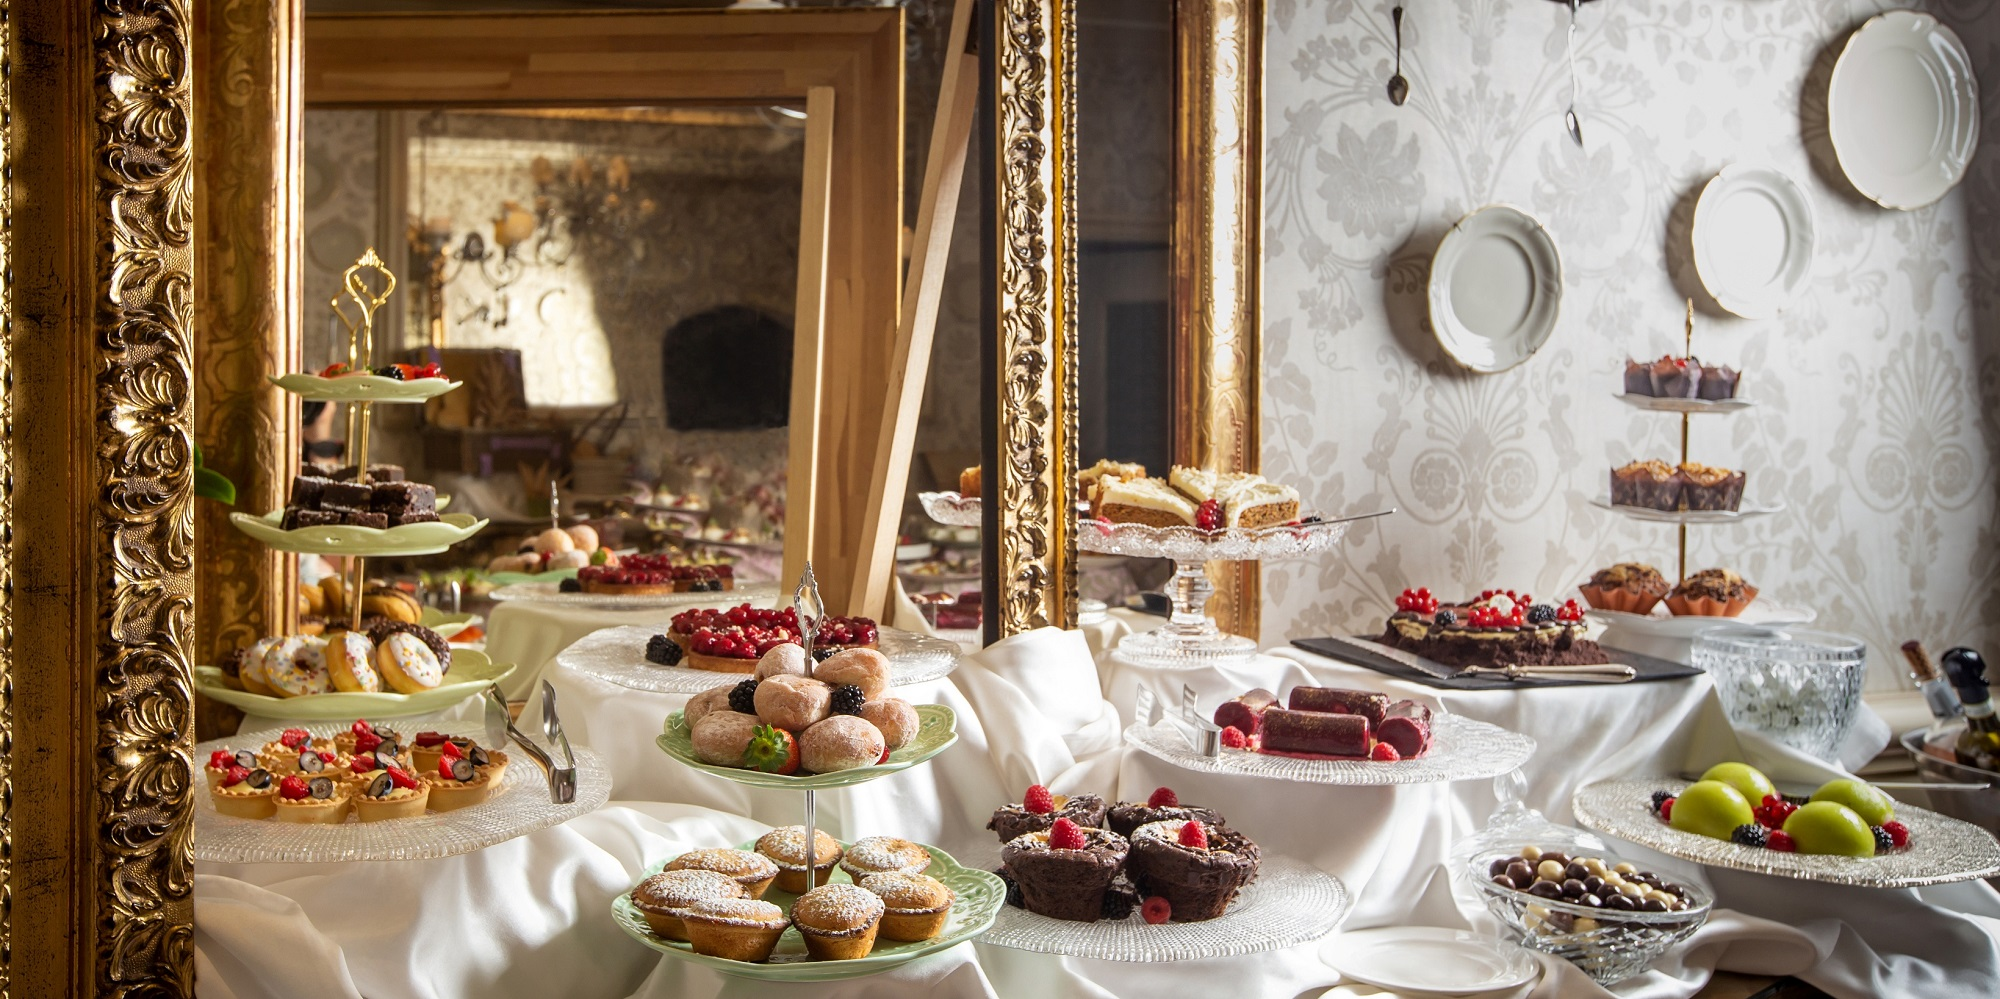 Milano Hotel Château Monfort brunch